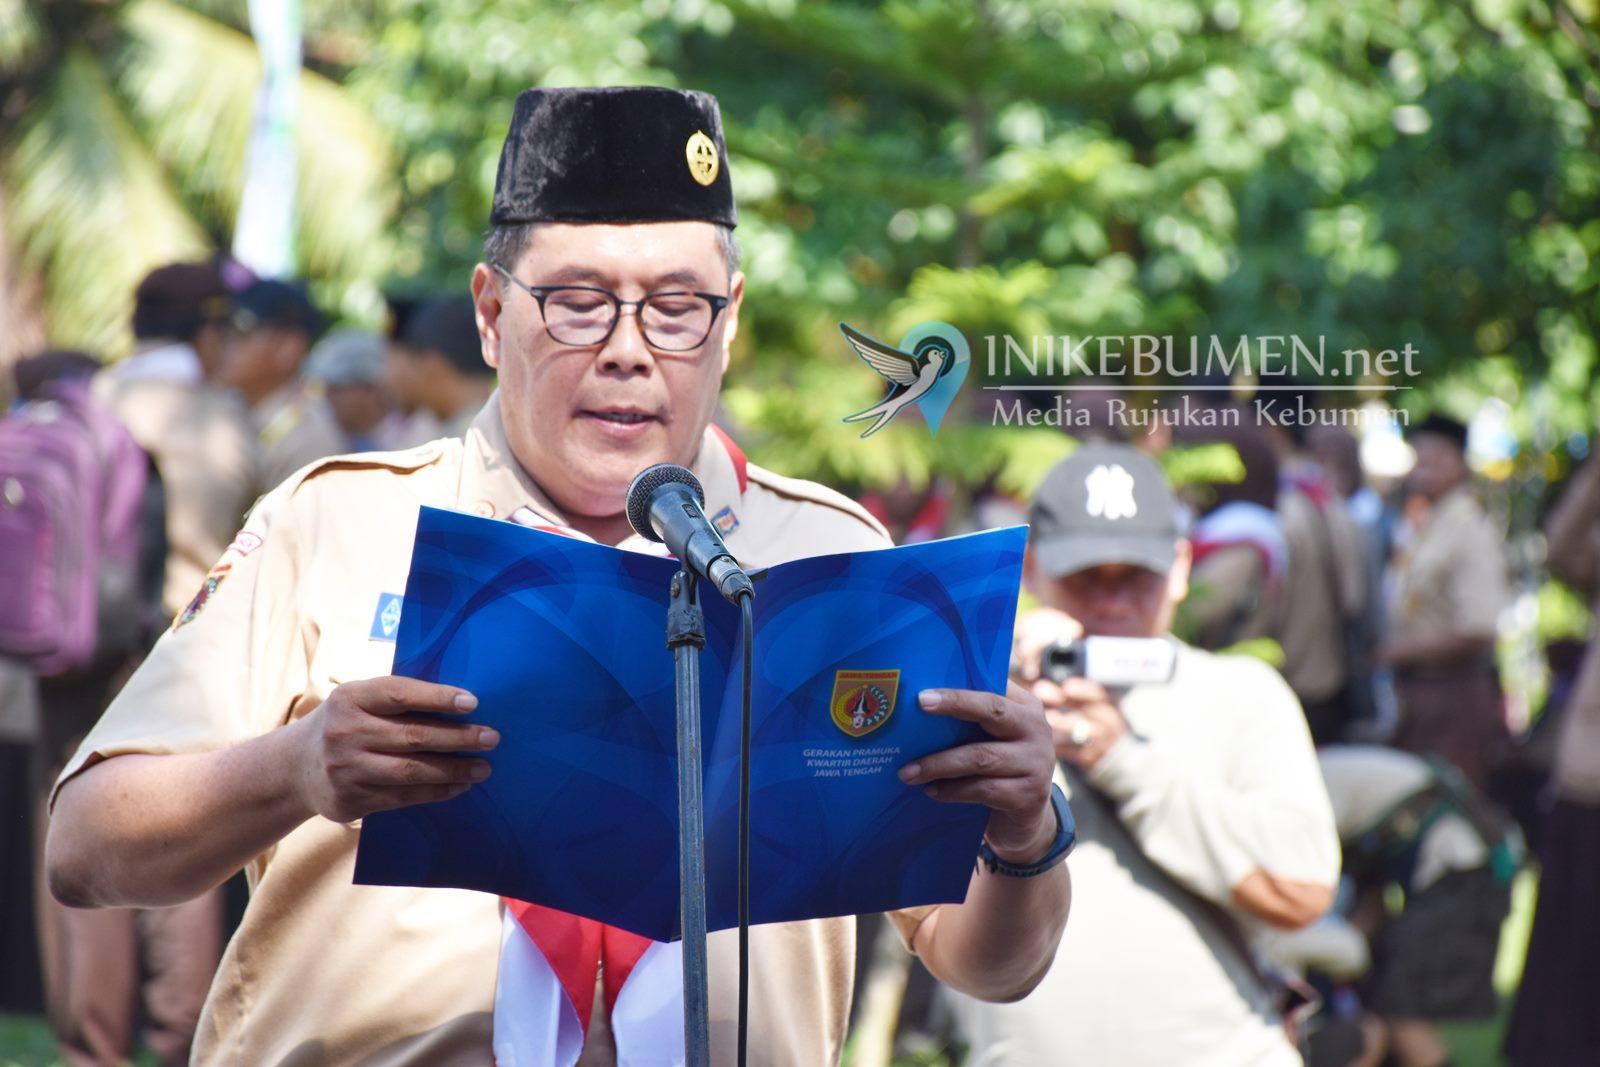 Buka Pesta Siaga, Zuhroh Yazid Mahfudz Kenalkan Kantor Pemkab Kebumen